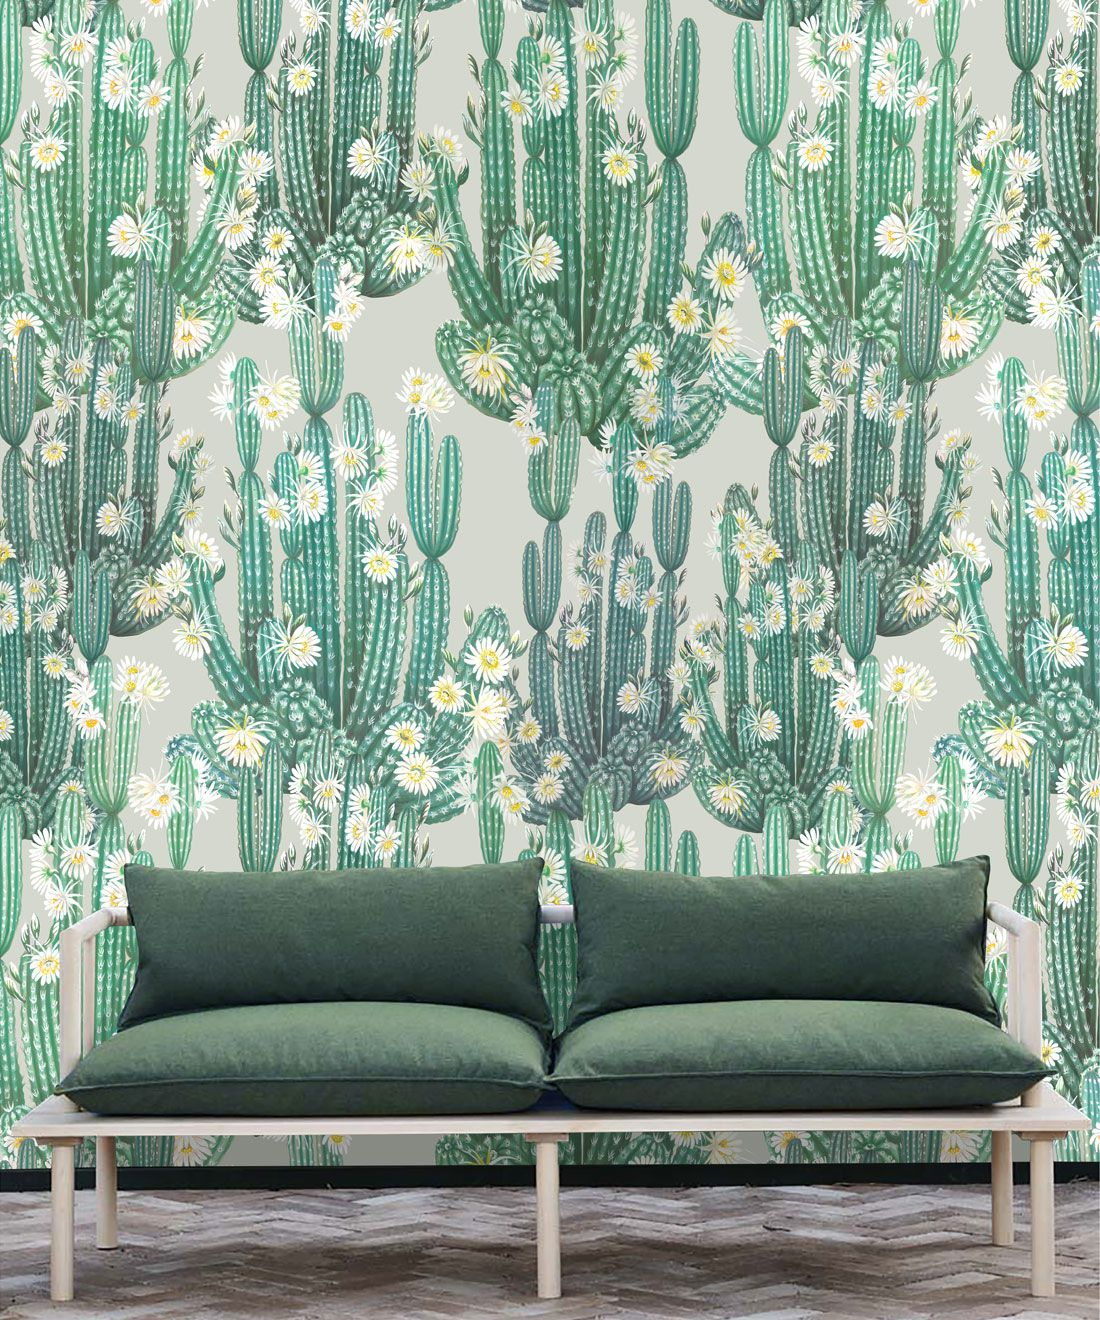 San Pedro Wallpaper Green • Cactus Wallpaper • Succulents Wallpaper • Desert Wallpaper Insitu behind sofa with green cushions